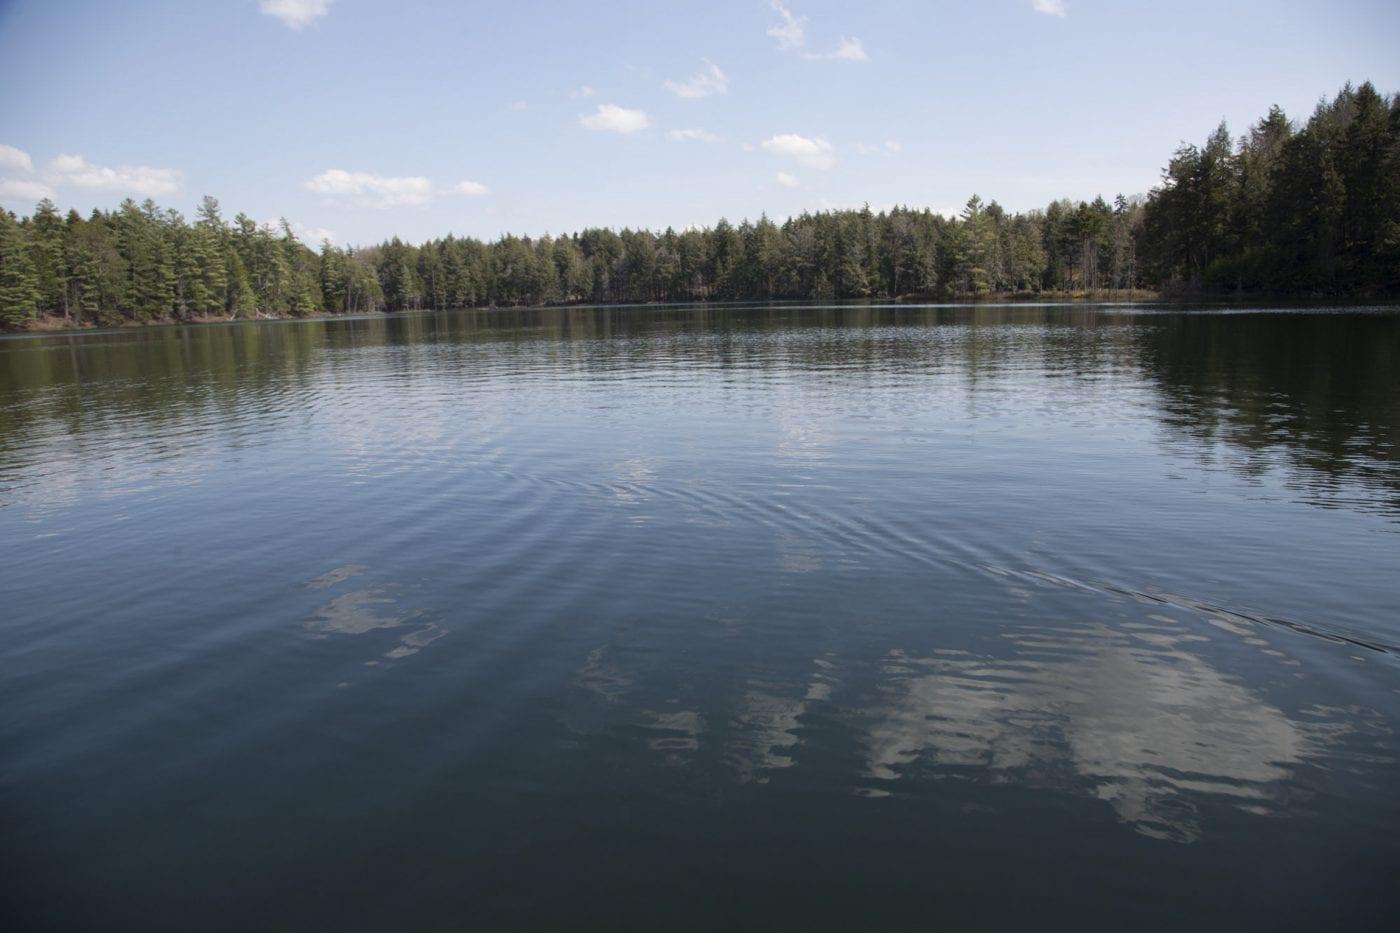 St Regis Canoe Area